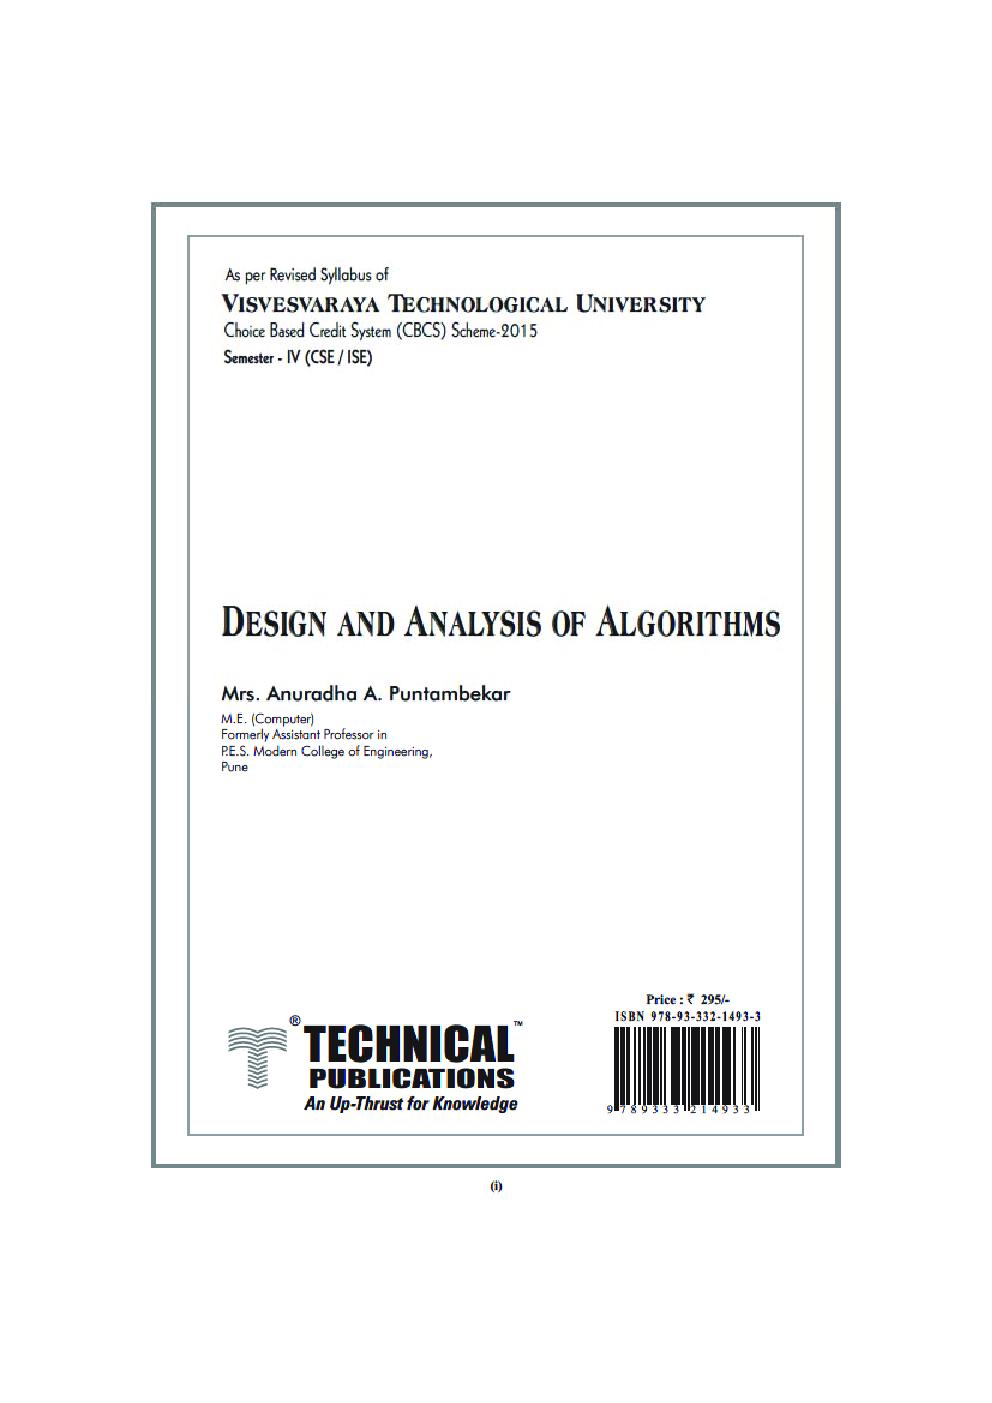 Design And Analysis Of Algorithms For VTU Course 17 CBCS (IV- CSE - 17CS43) - Page 2